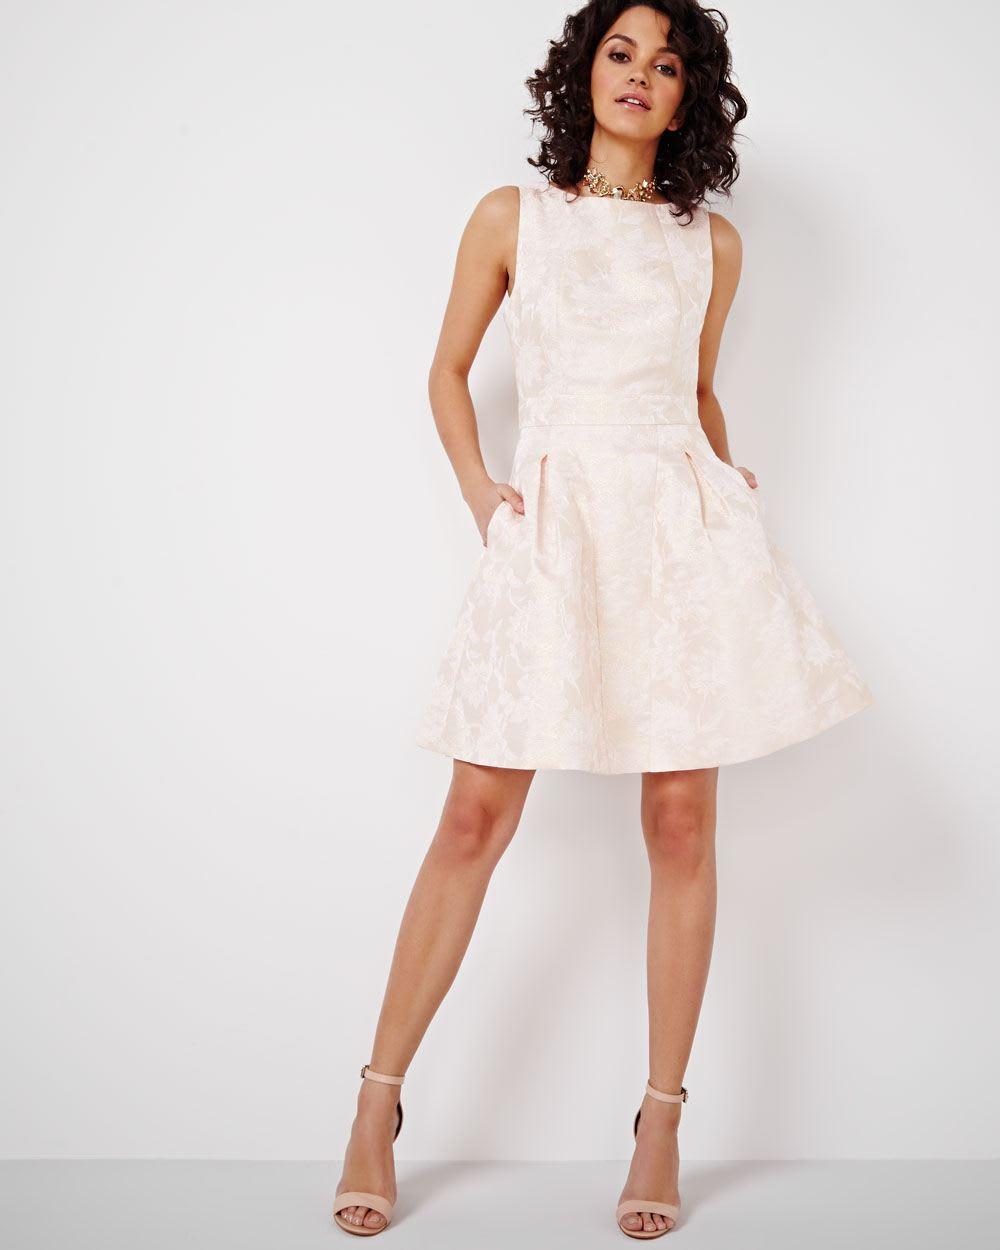 Jacquard dress Co EAY49YJ